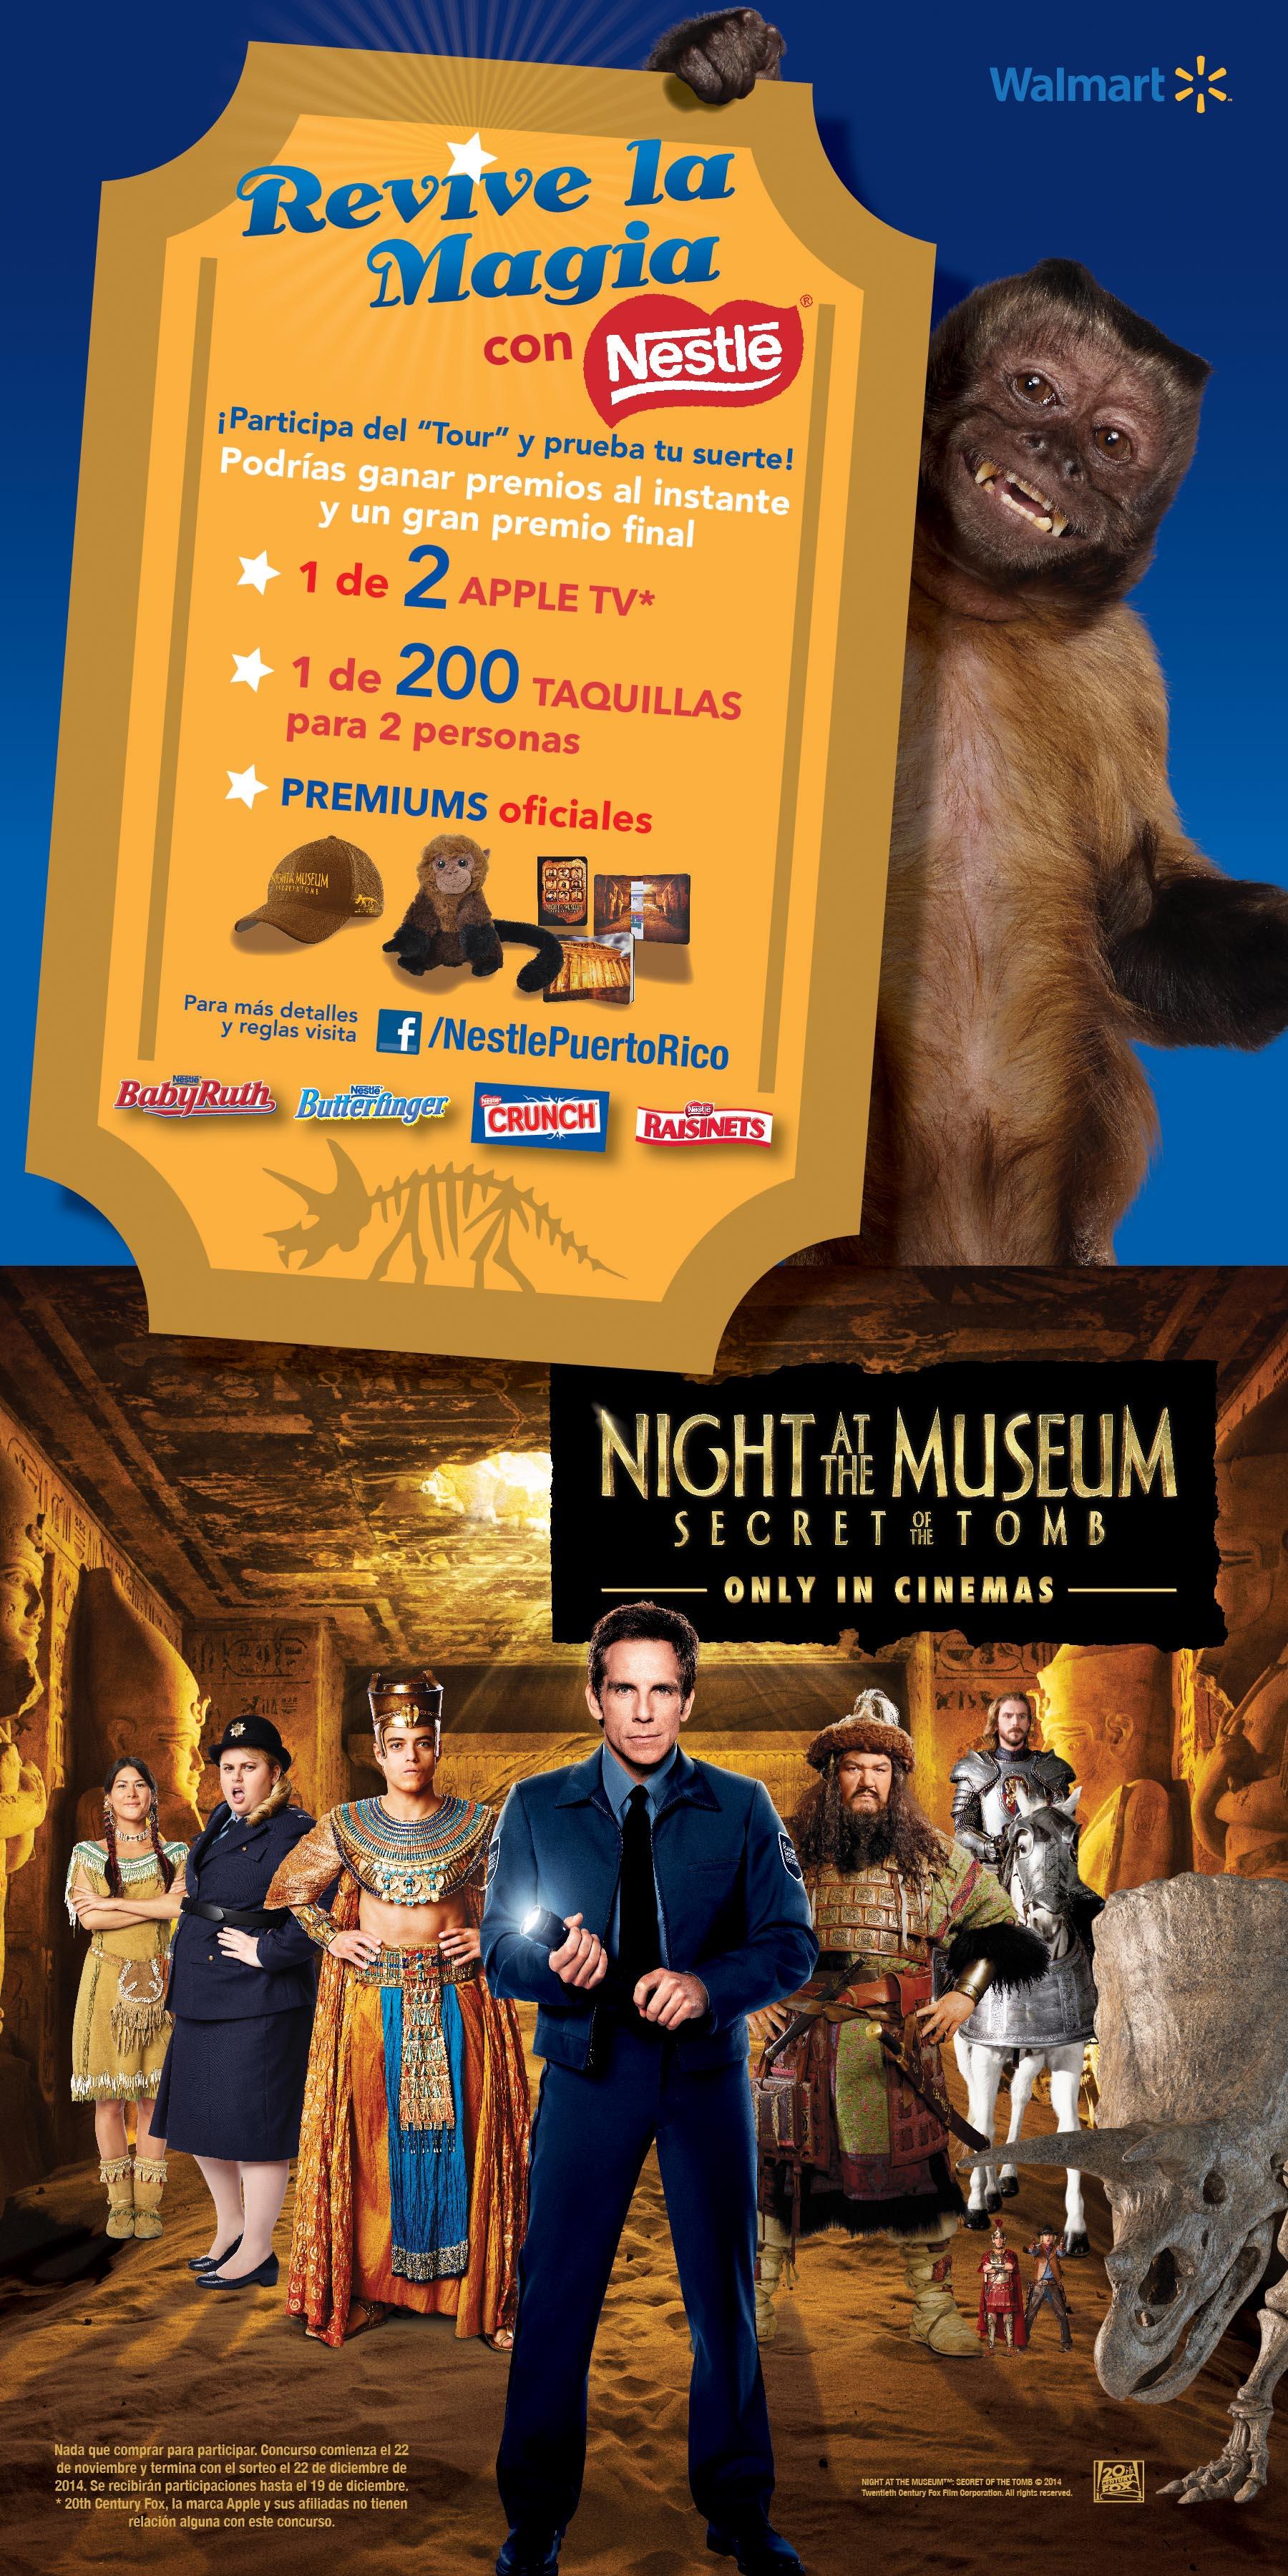 141119_3x6_Standbanner_Walmart_NightAtTheMuseumV2-01